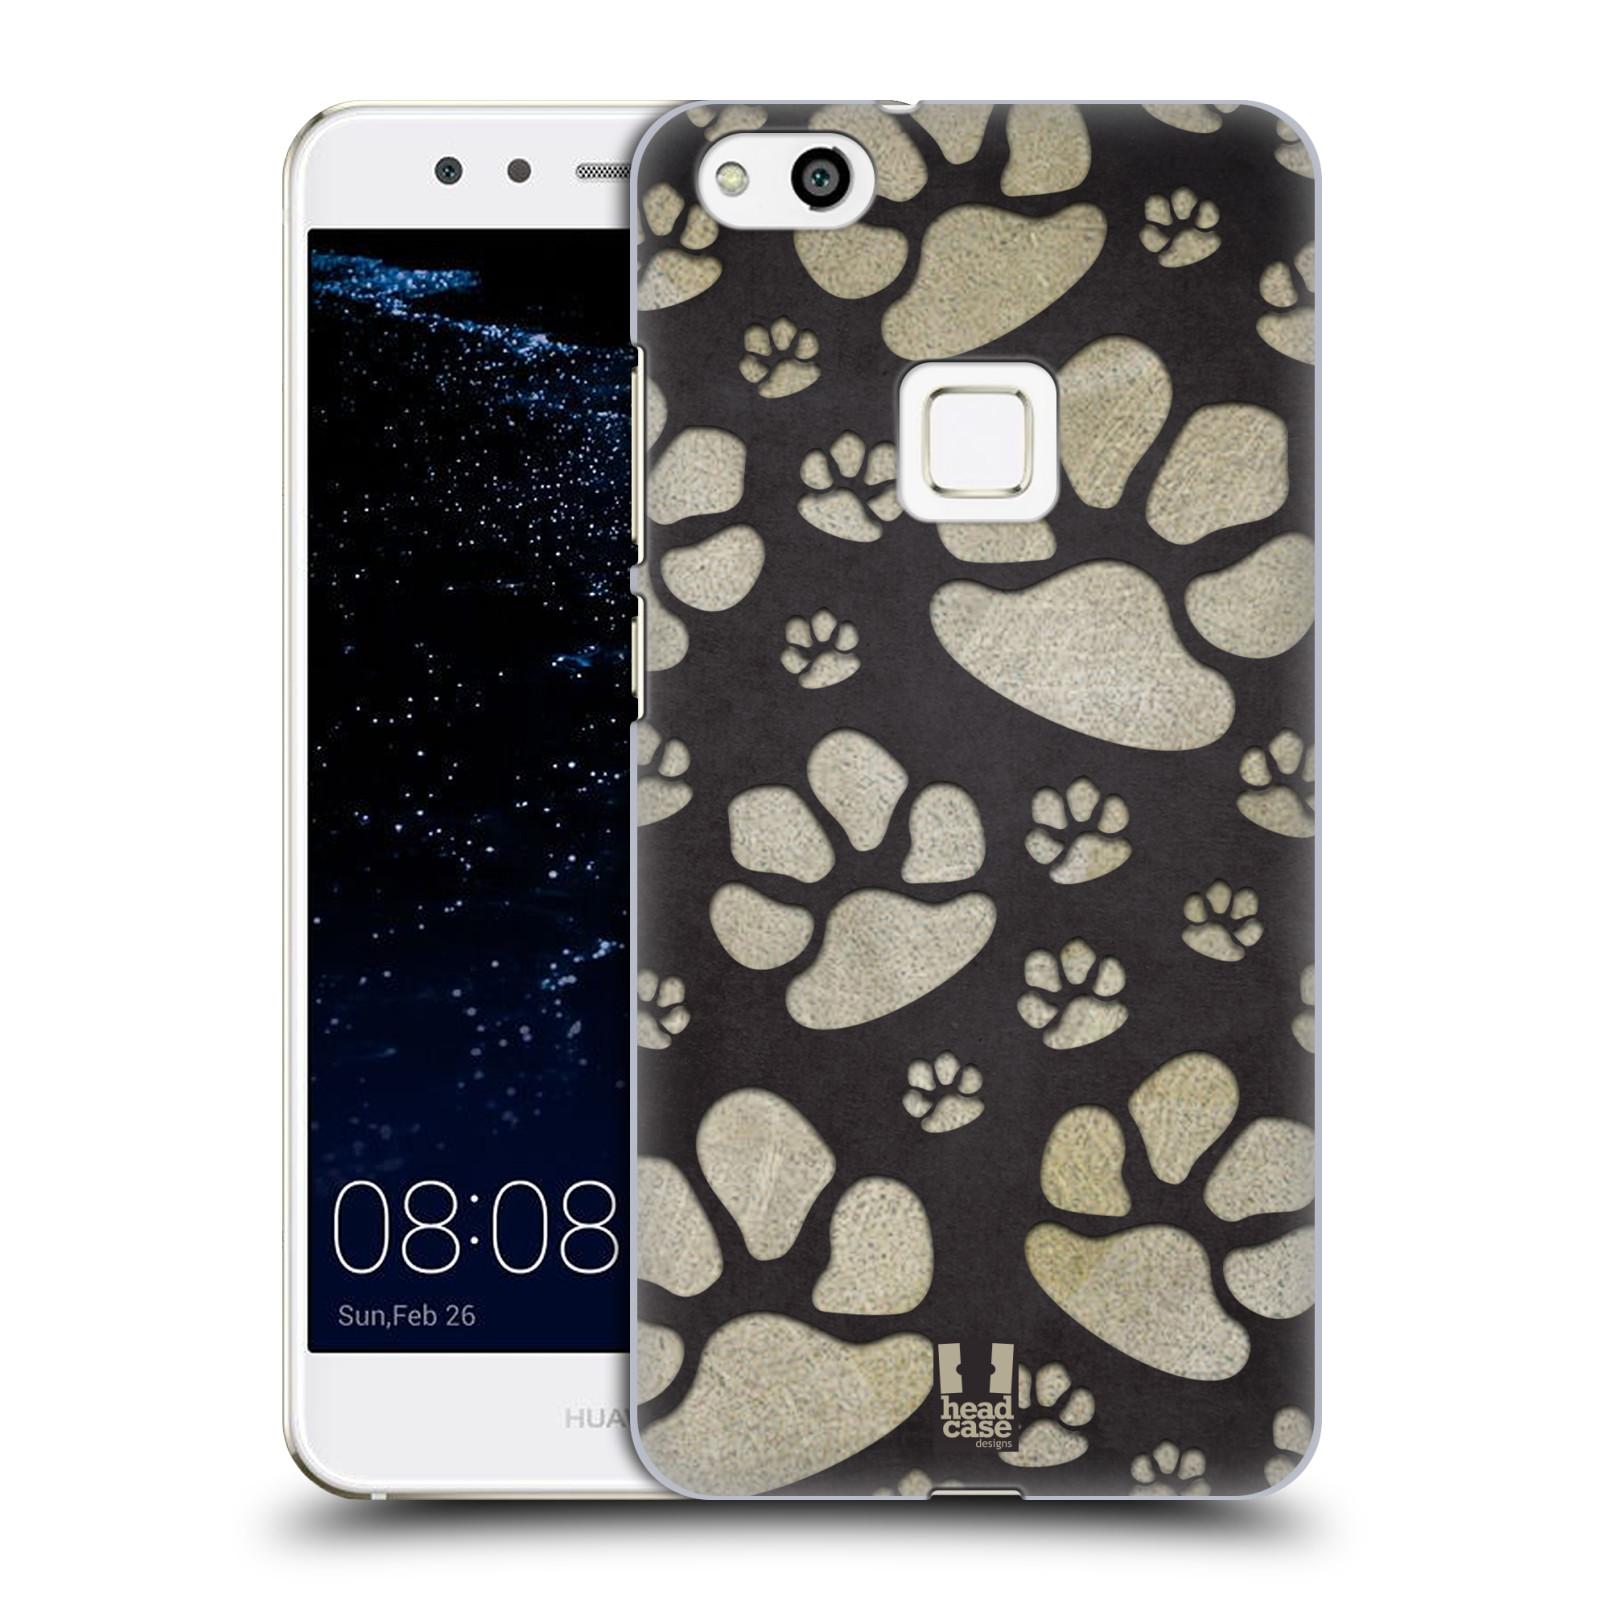 Plastové pouzdro na mobil Huawei P10 Lite Head Case - TLAPKY ŠEDÉ (Plastový kryt či obal na mobilní telefon Huawei P10 Lite Dual SIM (LX1/LX1A))